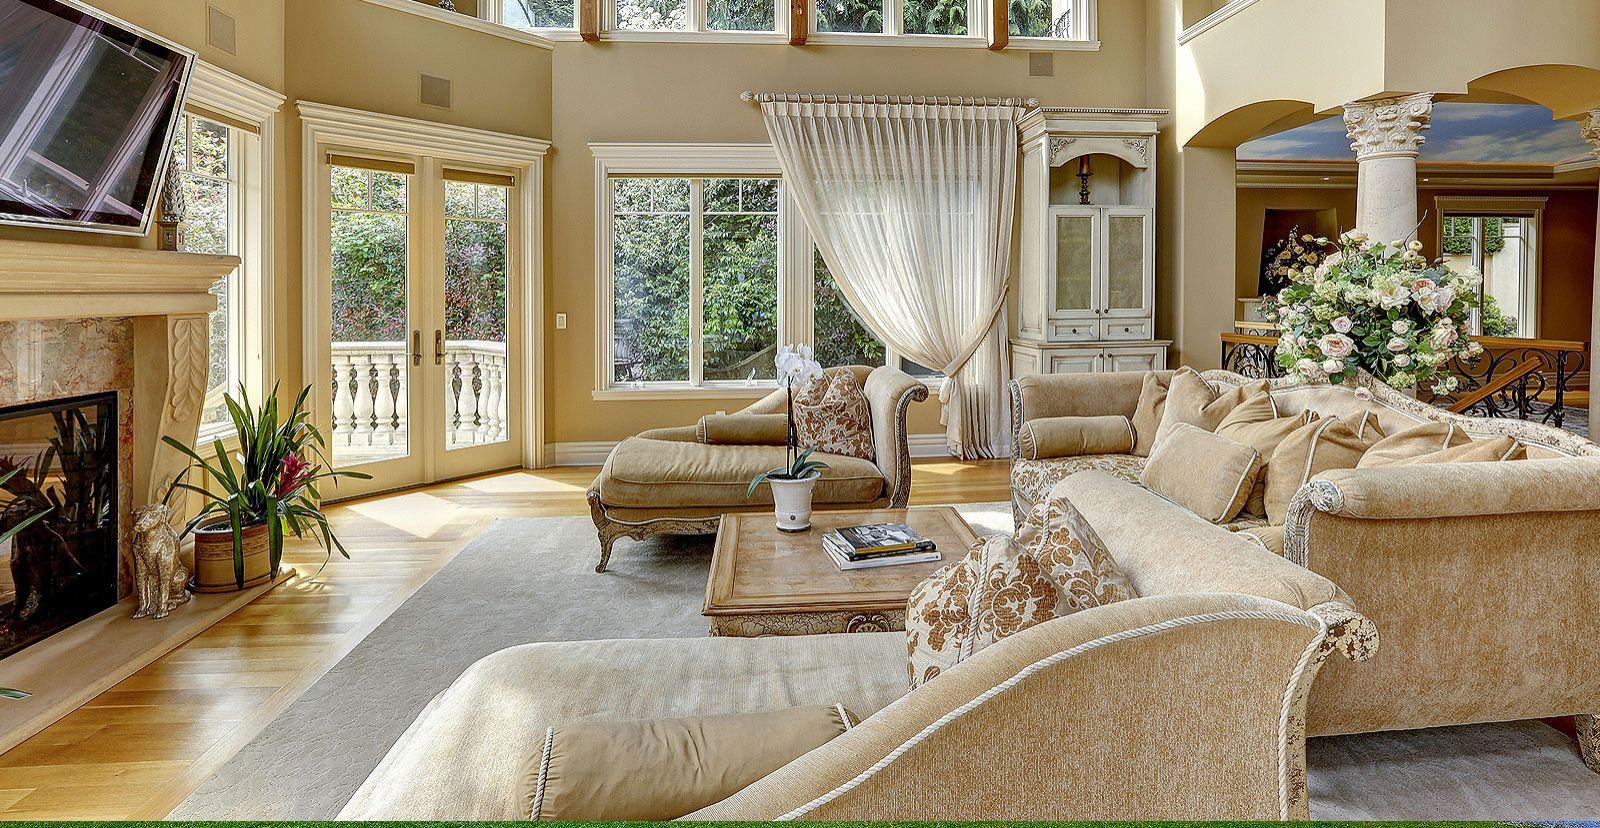 Living Room - Jenna D'Amico